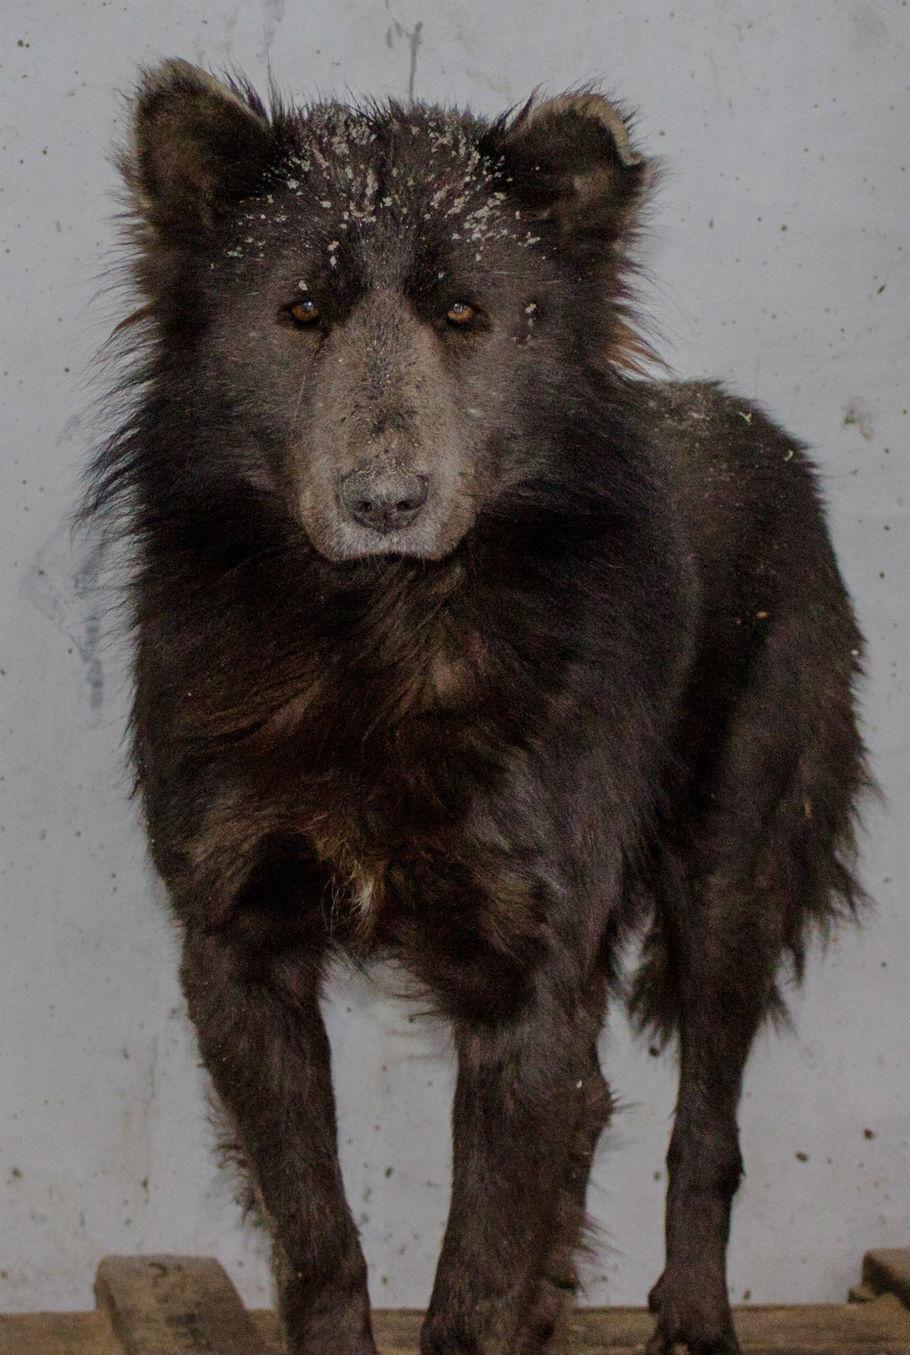 bear-dog hybrid standing